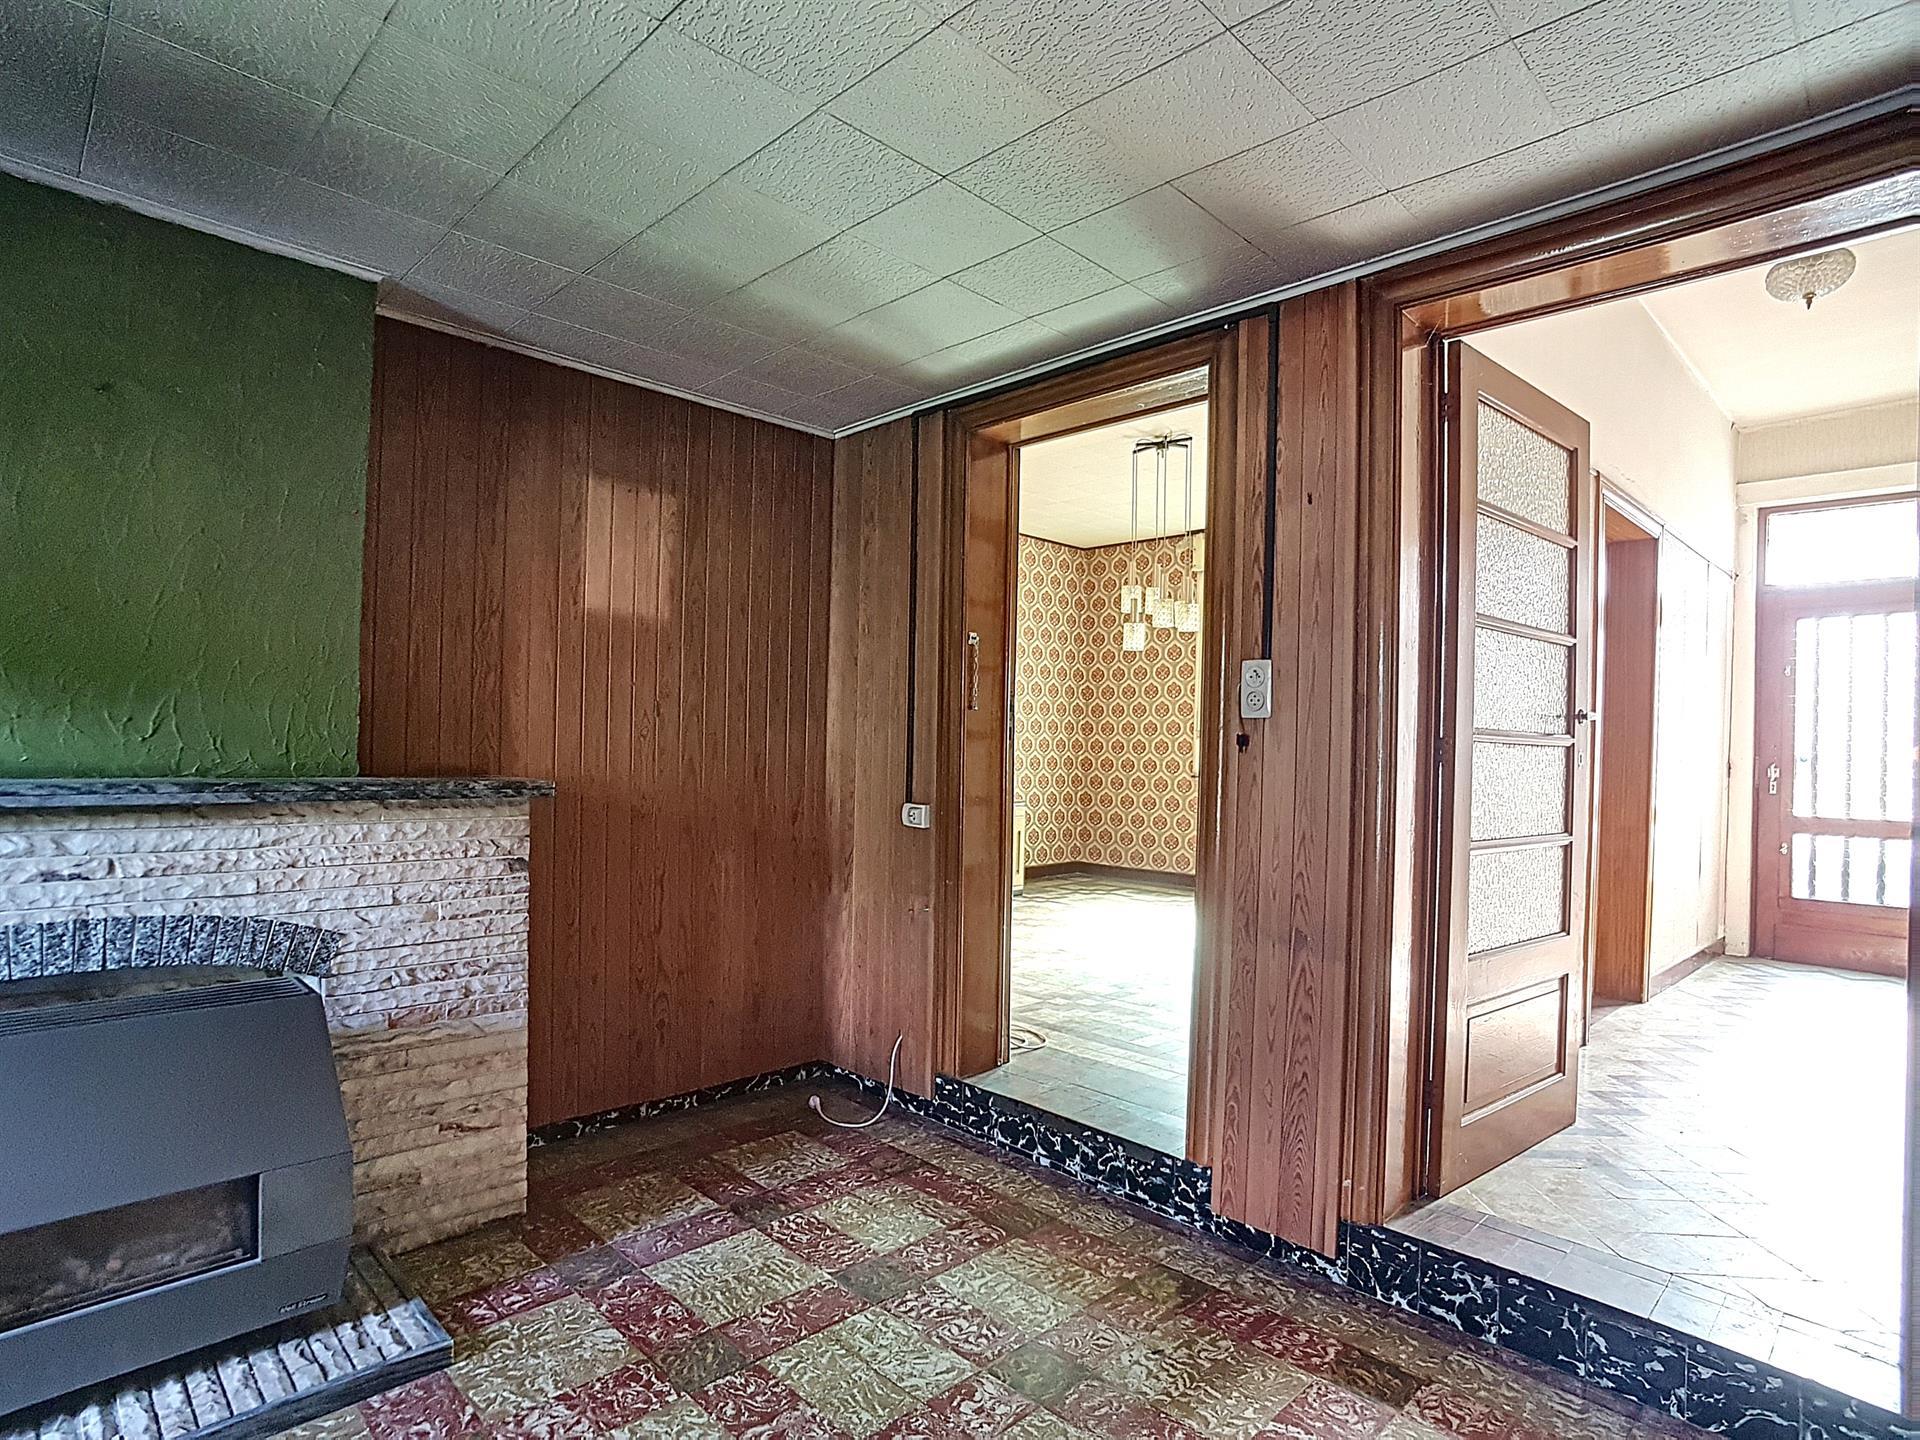 Maison - Zaventem Sterrebeek - #4507431-13